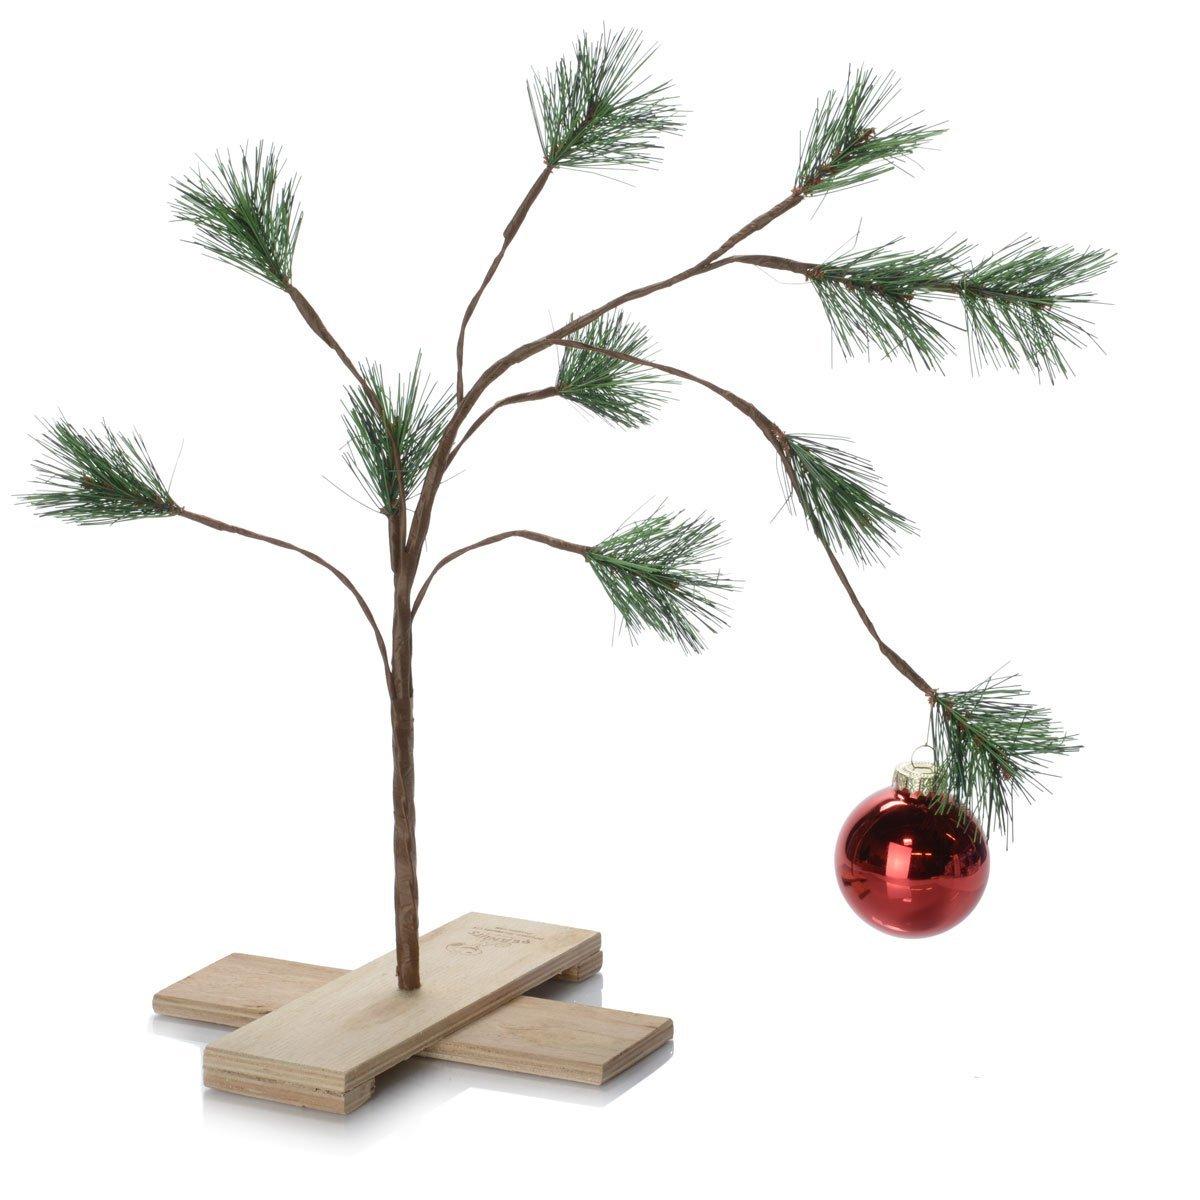 Charley Brown Christmas Tree: 11 Alternative Christmas Trees For The Holidays 2017